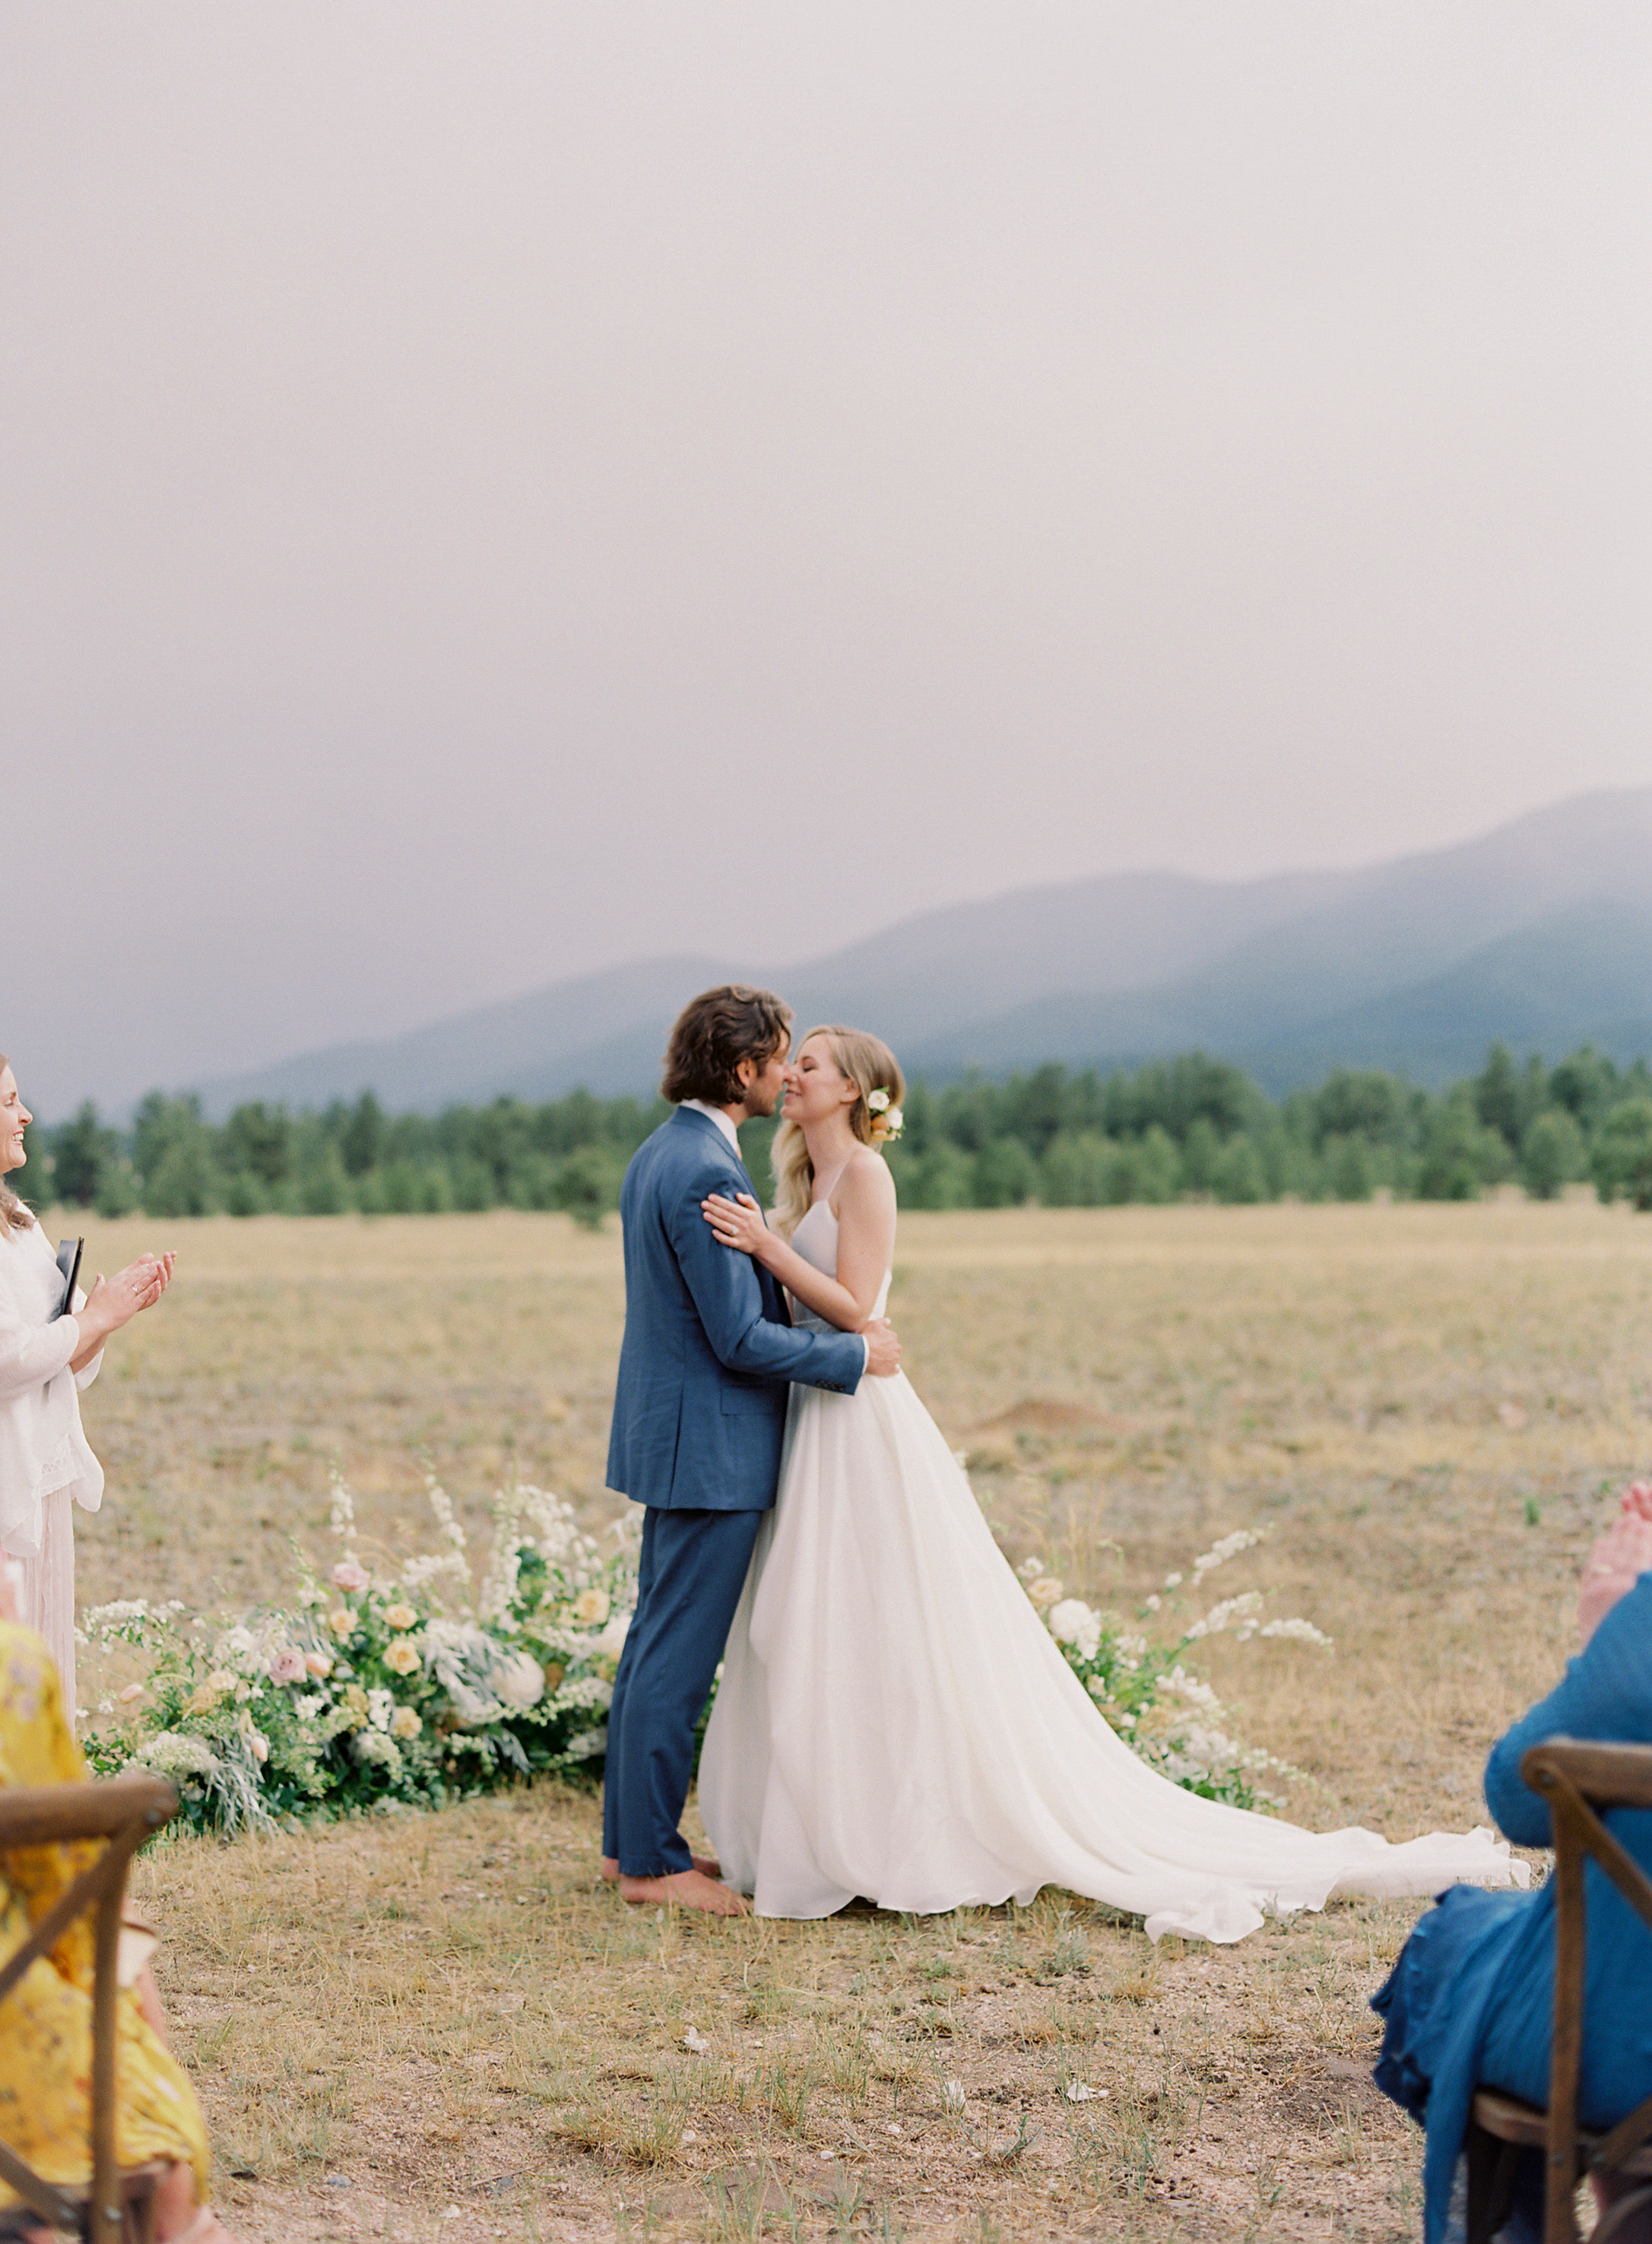 Jessica and Thomas-Wedding-Carrie King Photographer-17.jpg